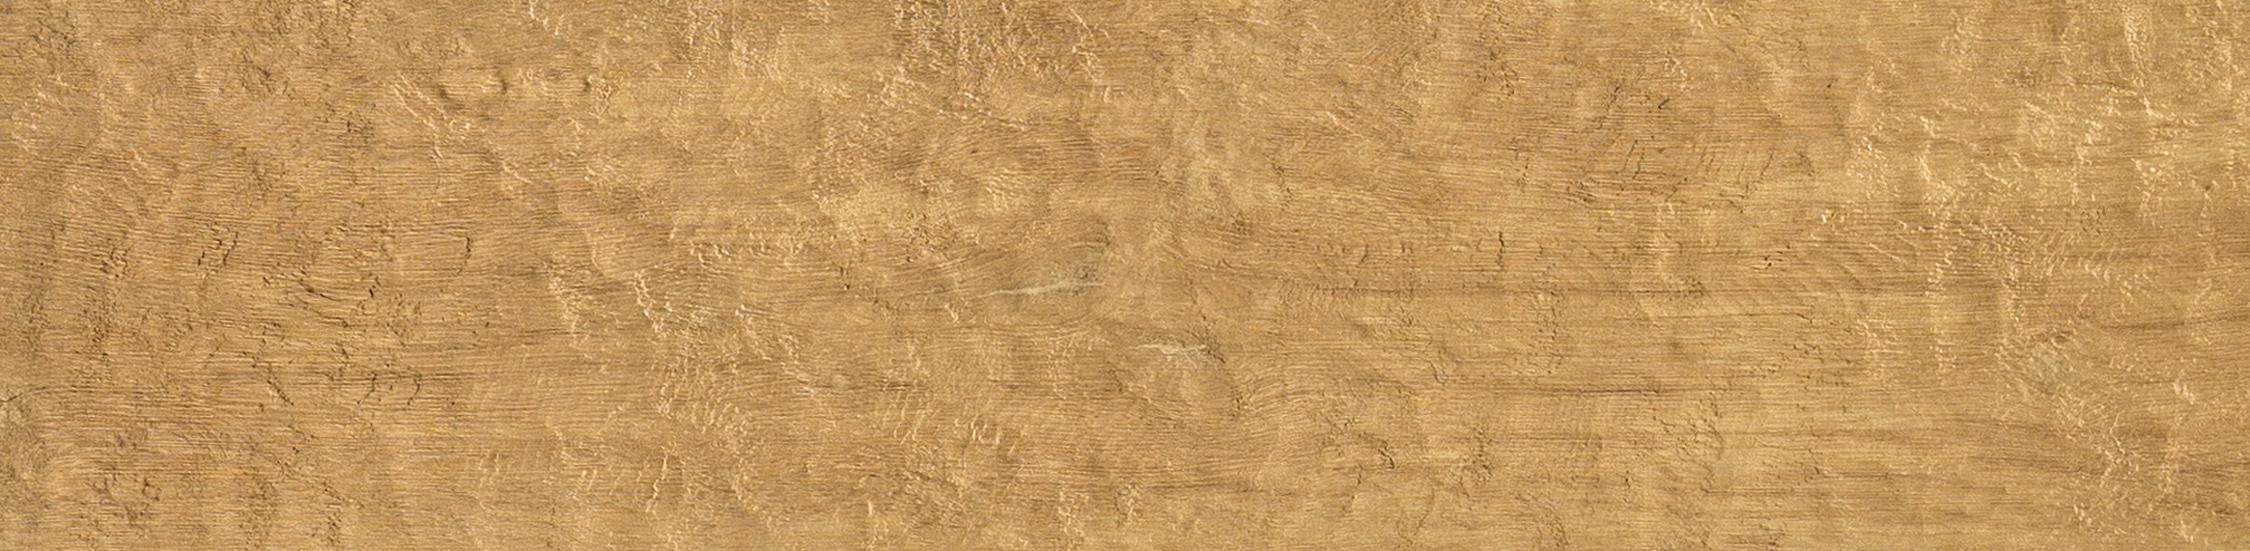 natural_life_wood_vanilla_22x90_grip